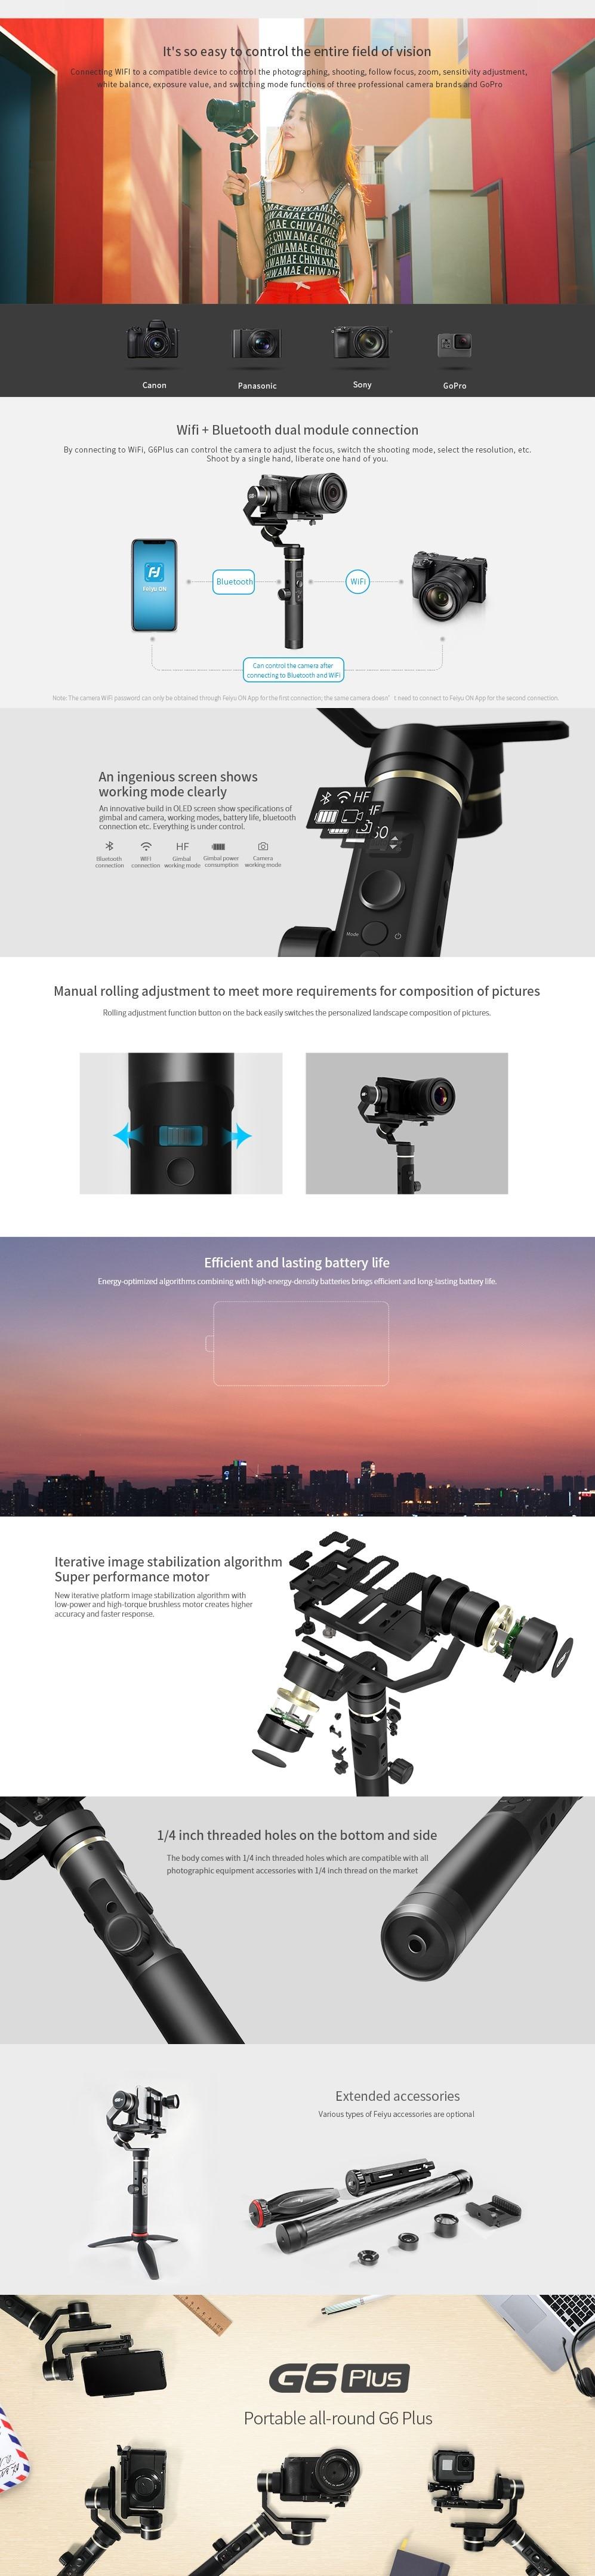 Feiyu G6 Plus 3-Axis Handheld Gimbal Stabilizer For Gopro,Smartphone,Mirrorless Digital Pocket Cameras Payload 800g Splash Proof 2